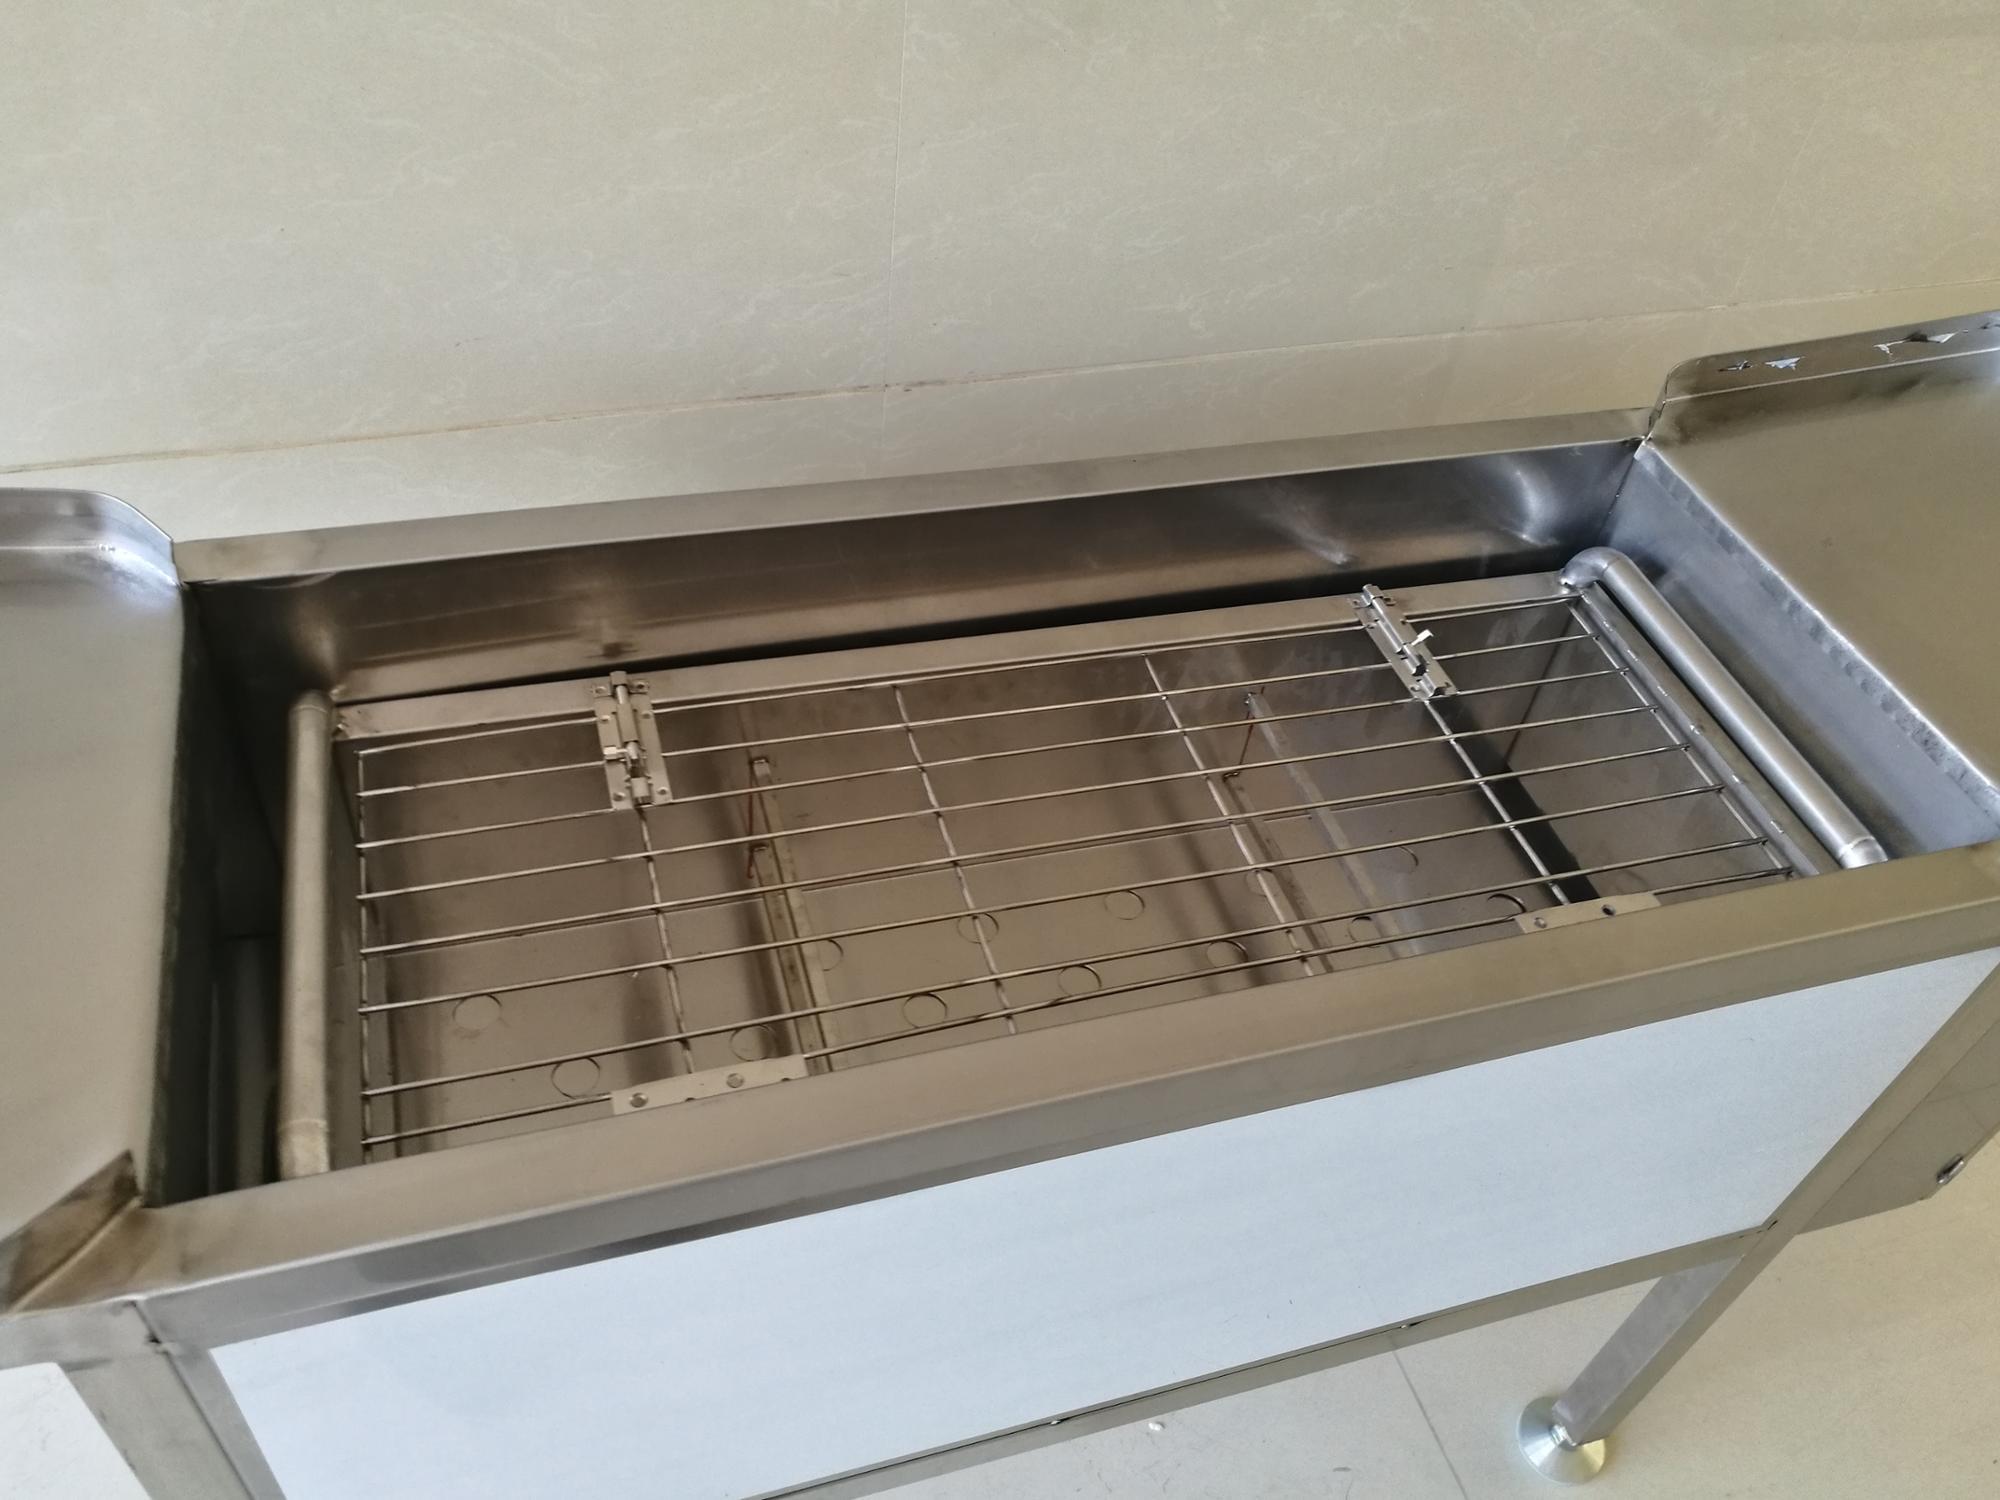 water-bath-tester-machine-for-aerosol-products-2